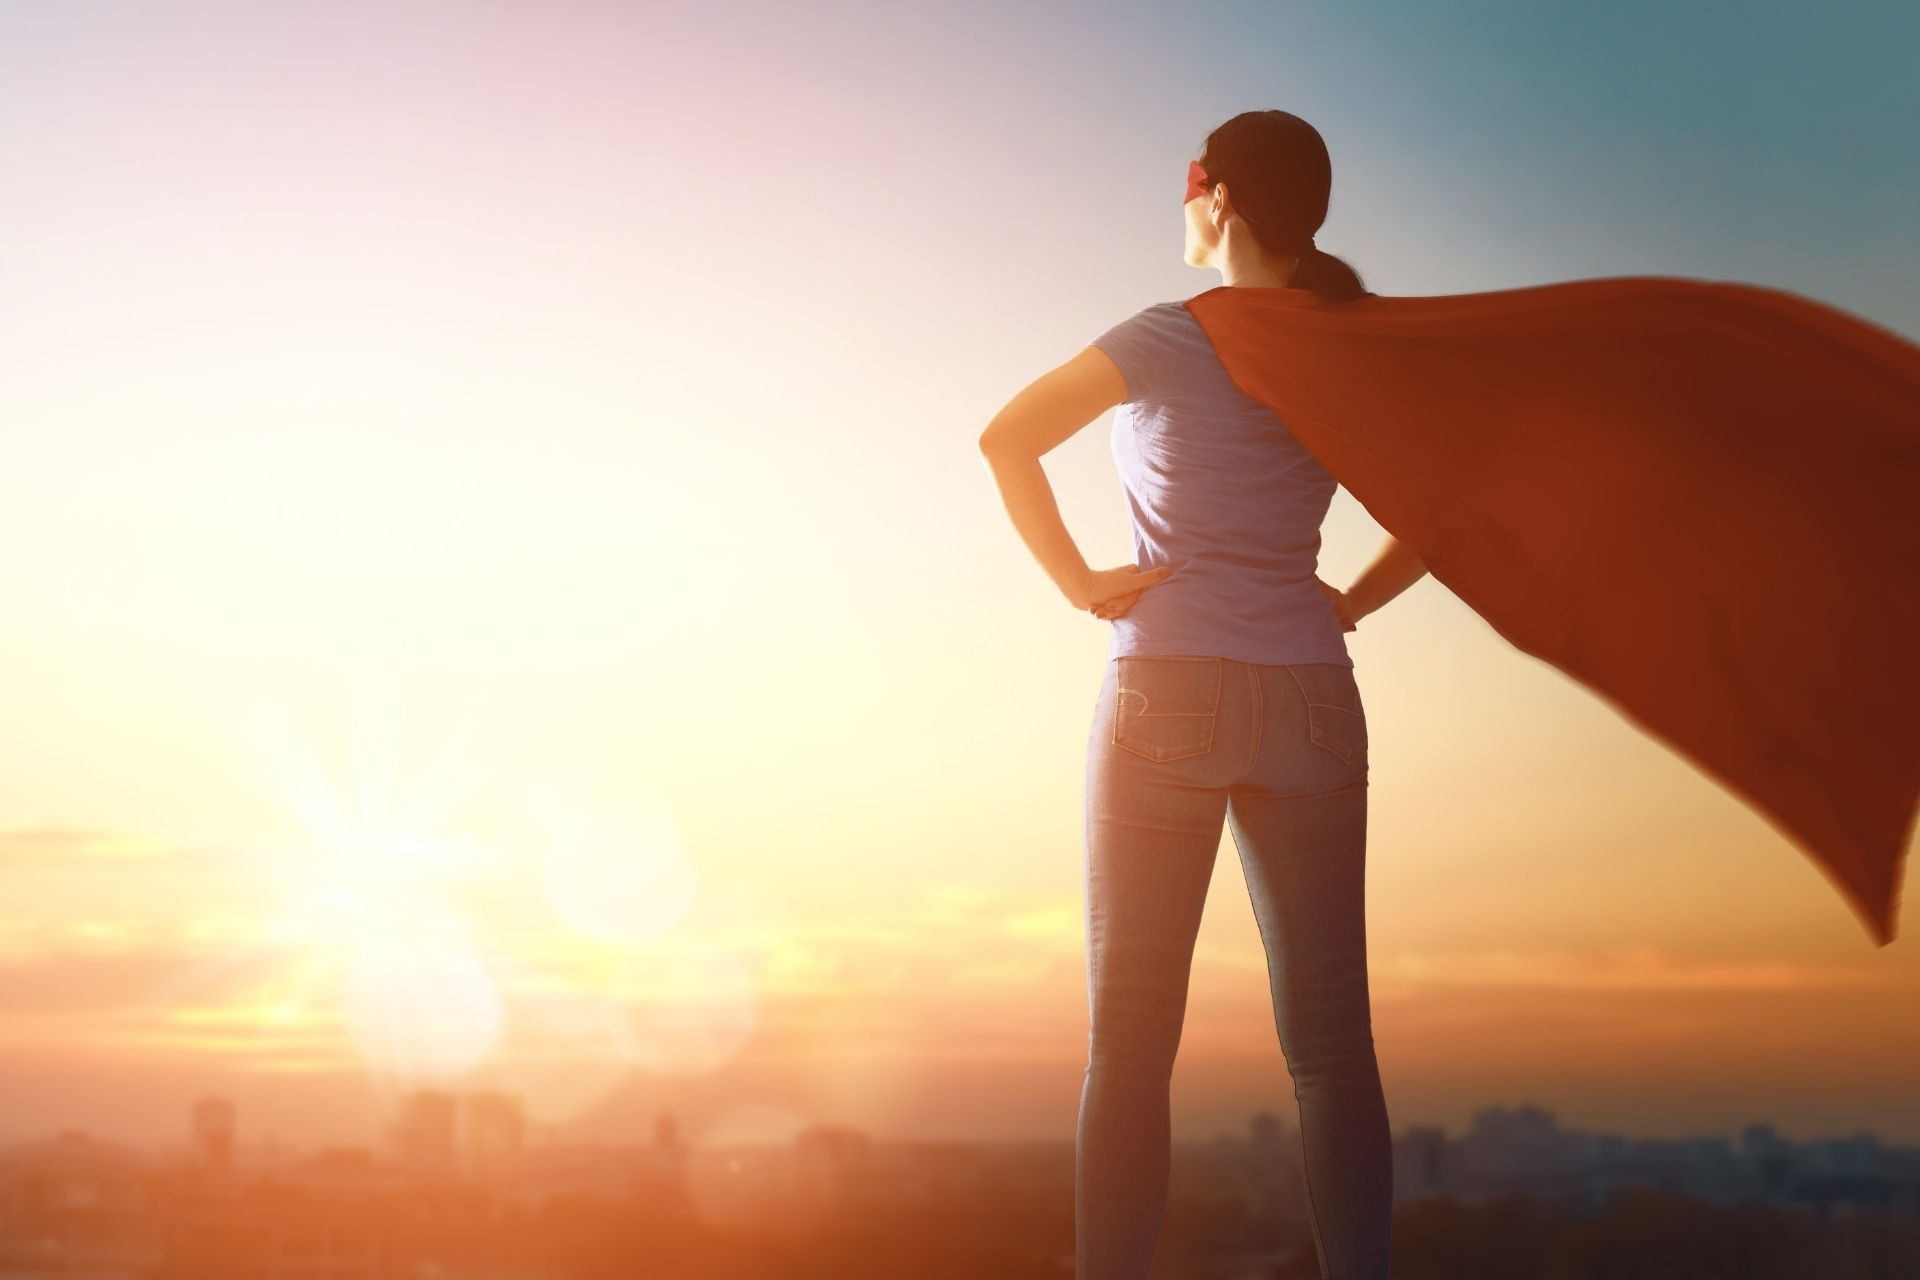 Superheldin im Sonnenaufgang